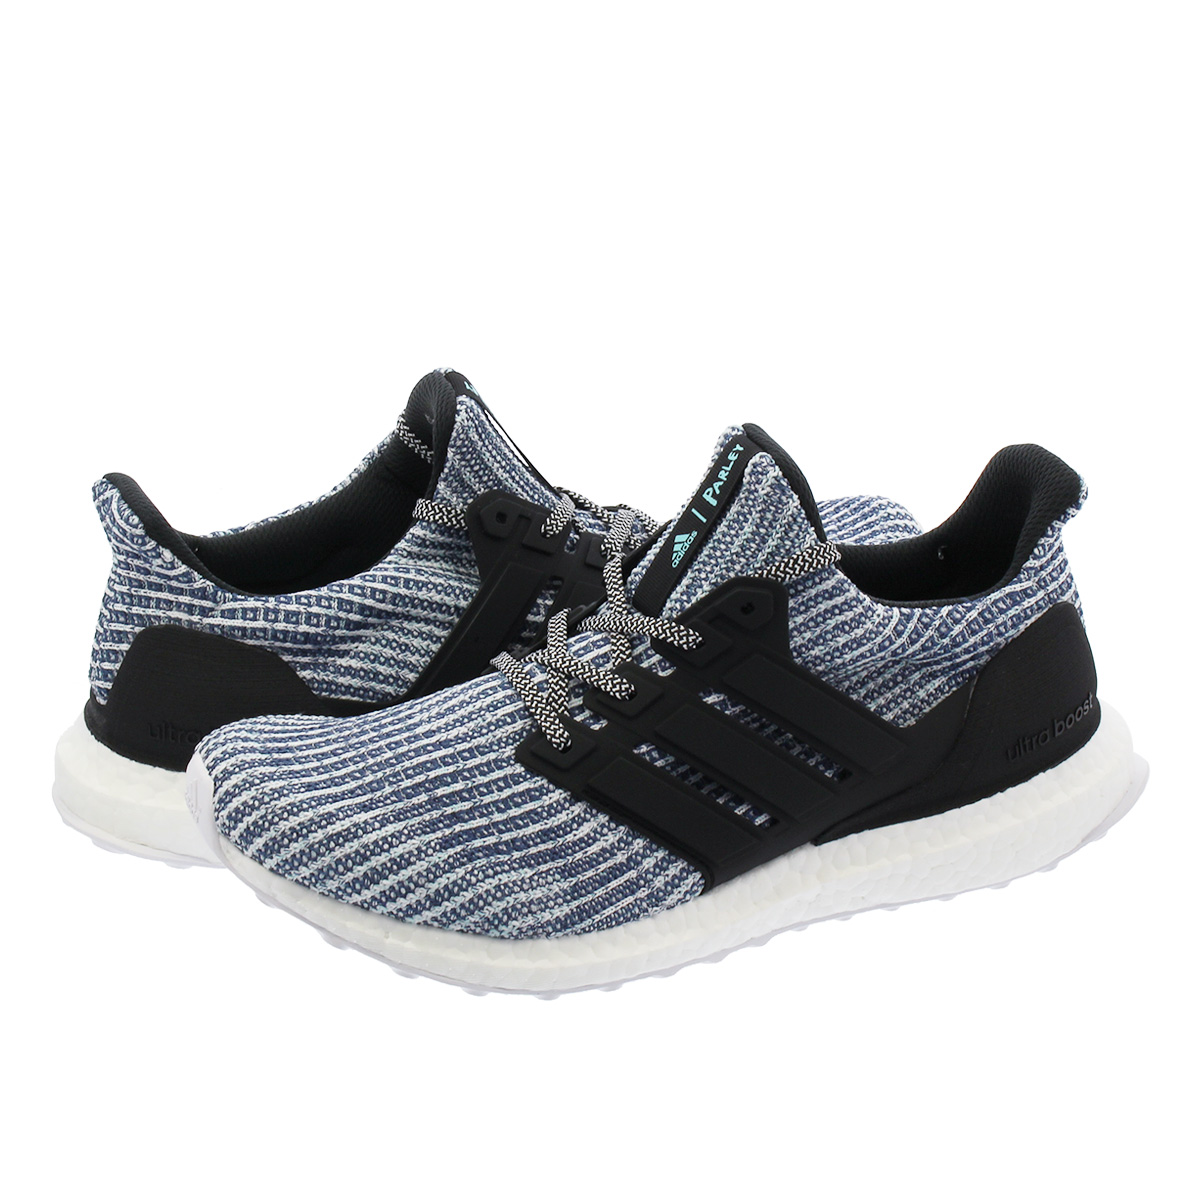 cf2ae555791 adidas ULTRA BOOST PARLEY Adidas ultra boost gone lei WHITE CARBON BLUE  SPIRIT bc0248